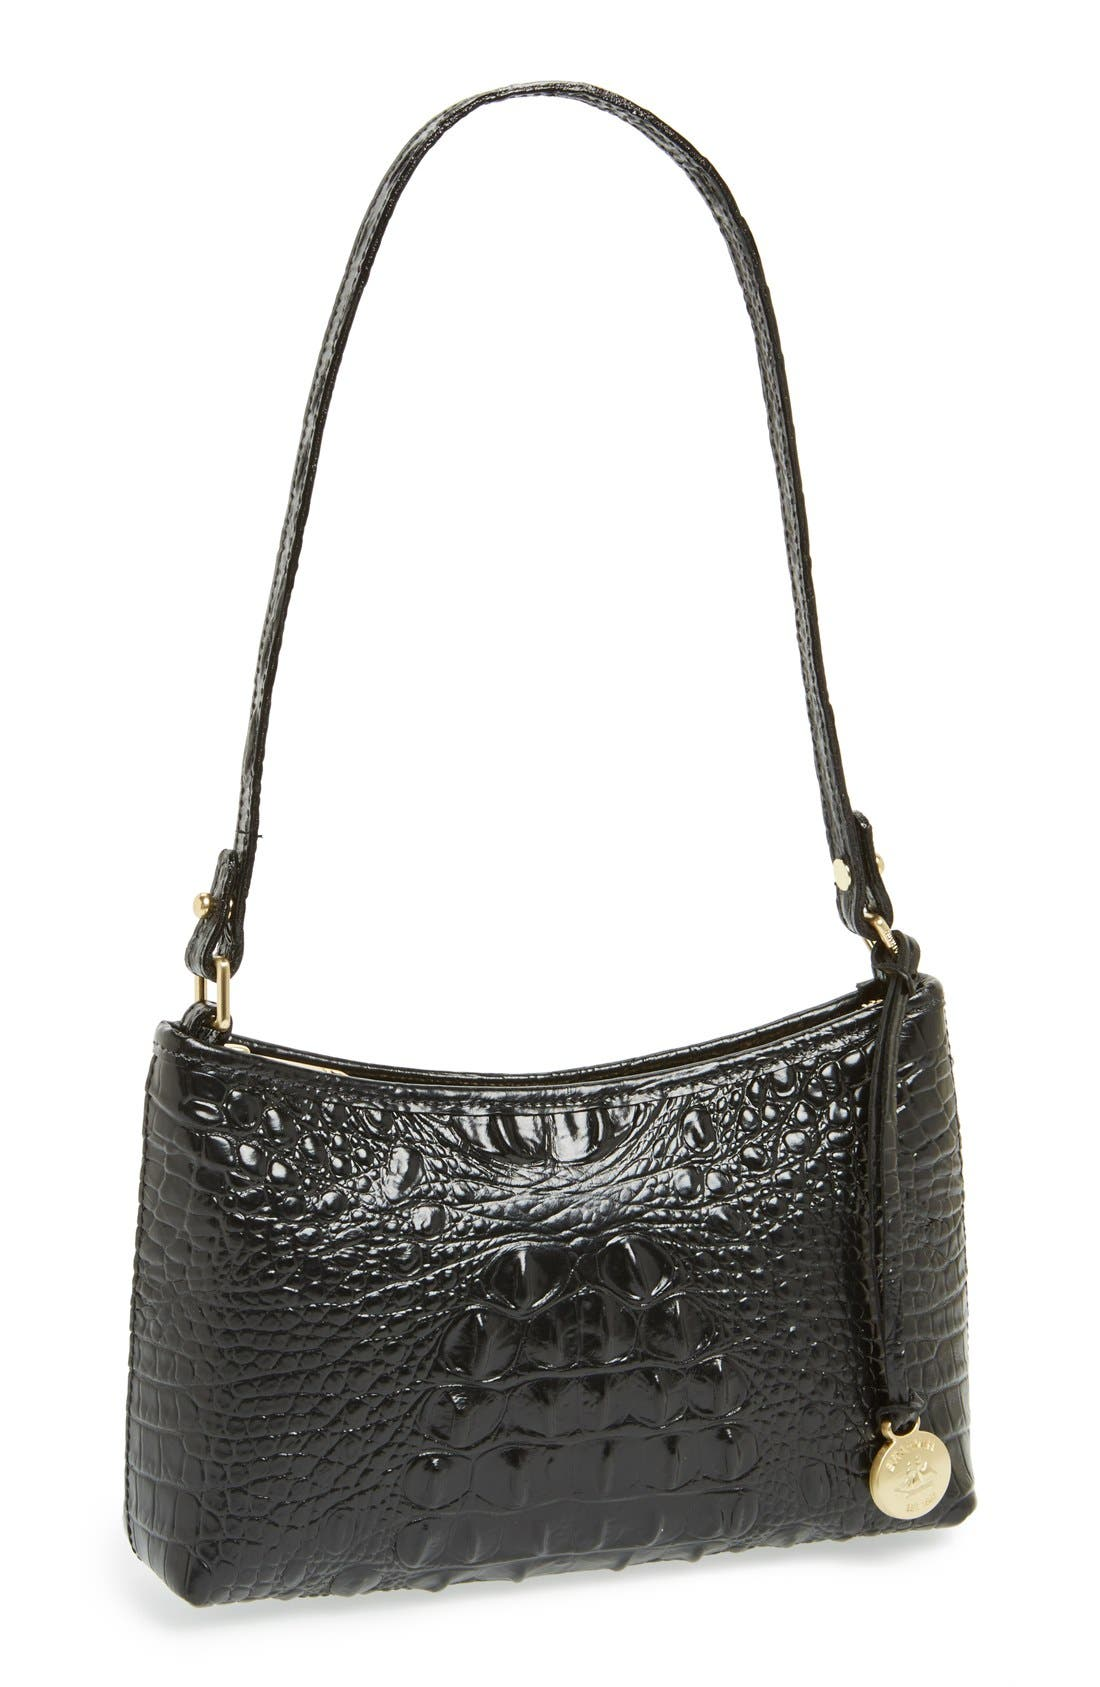 Alternate Image 1 Selected - Brahmin 'Anytime - Mini' Convertible Handbag